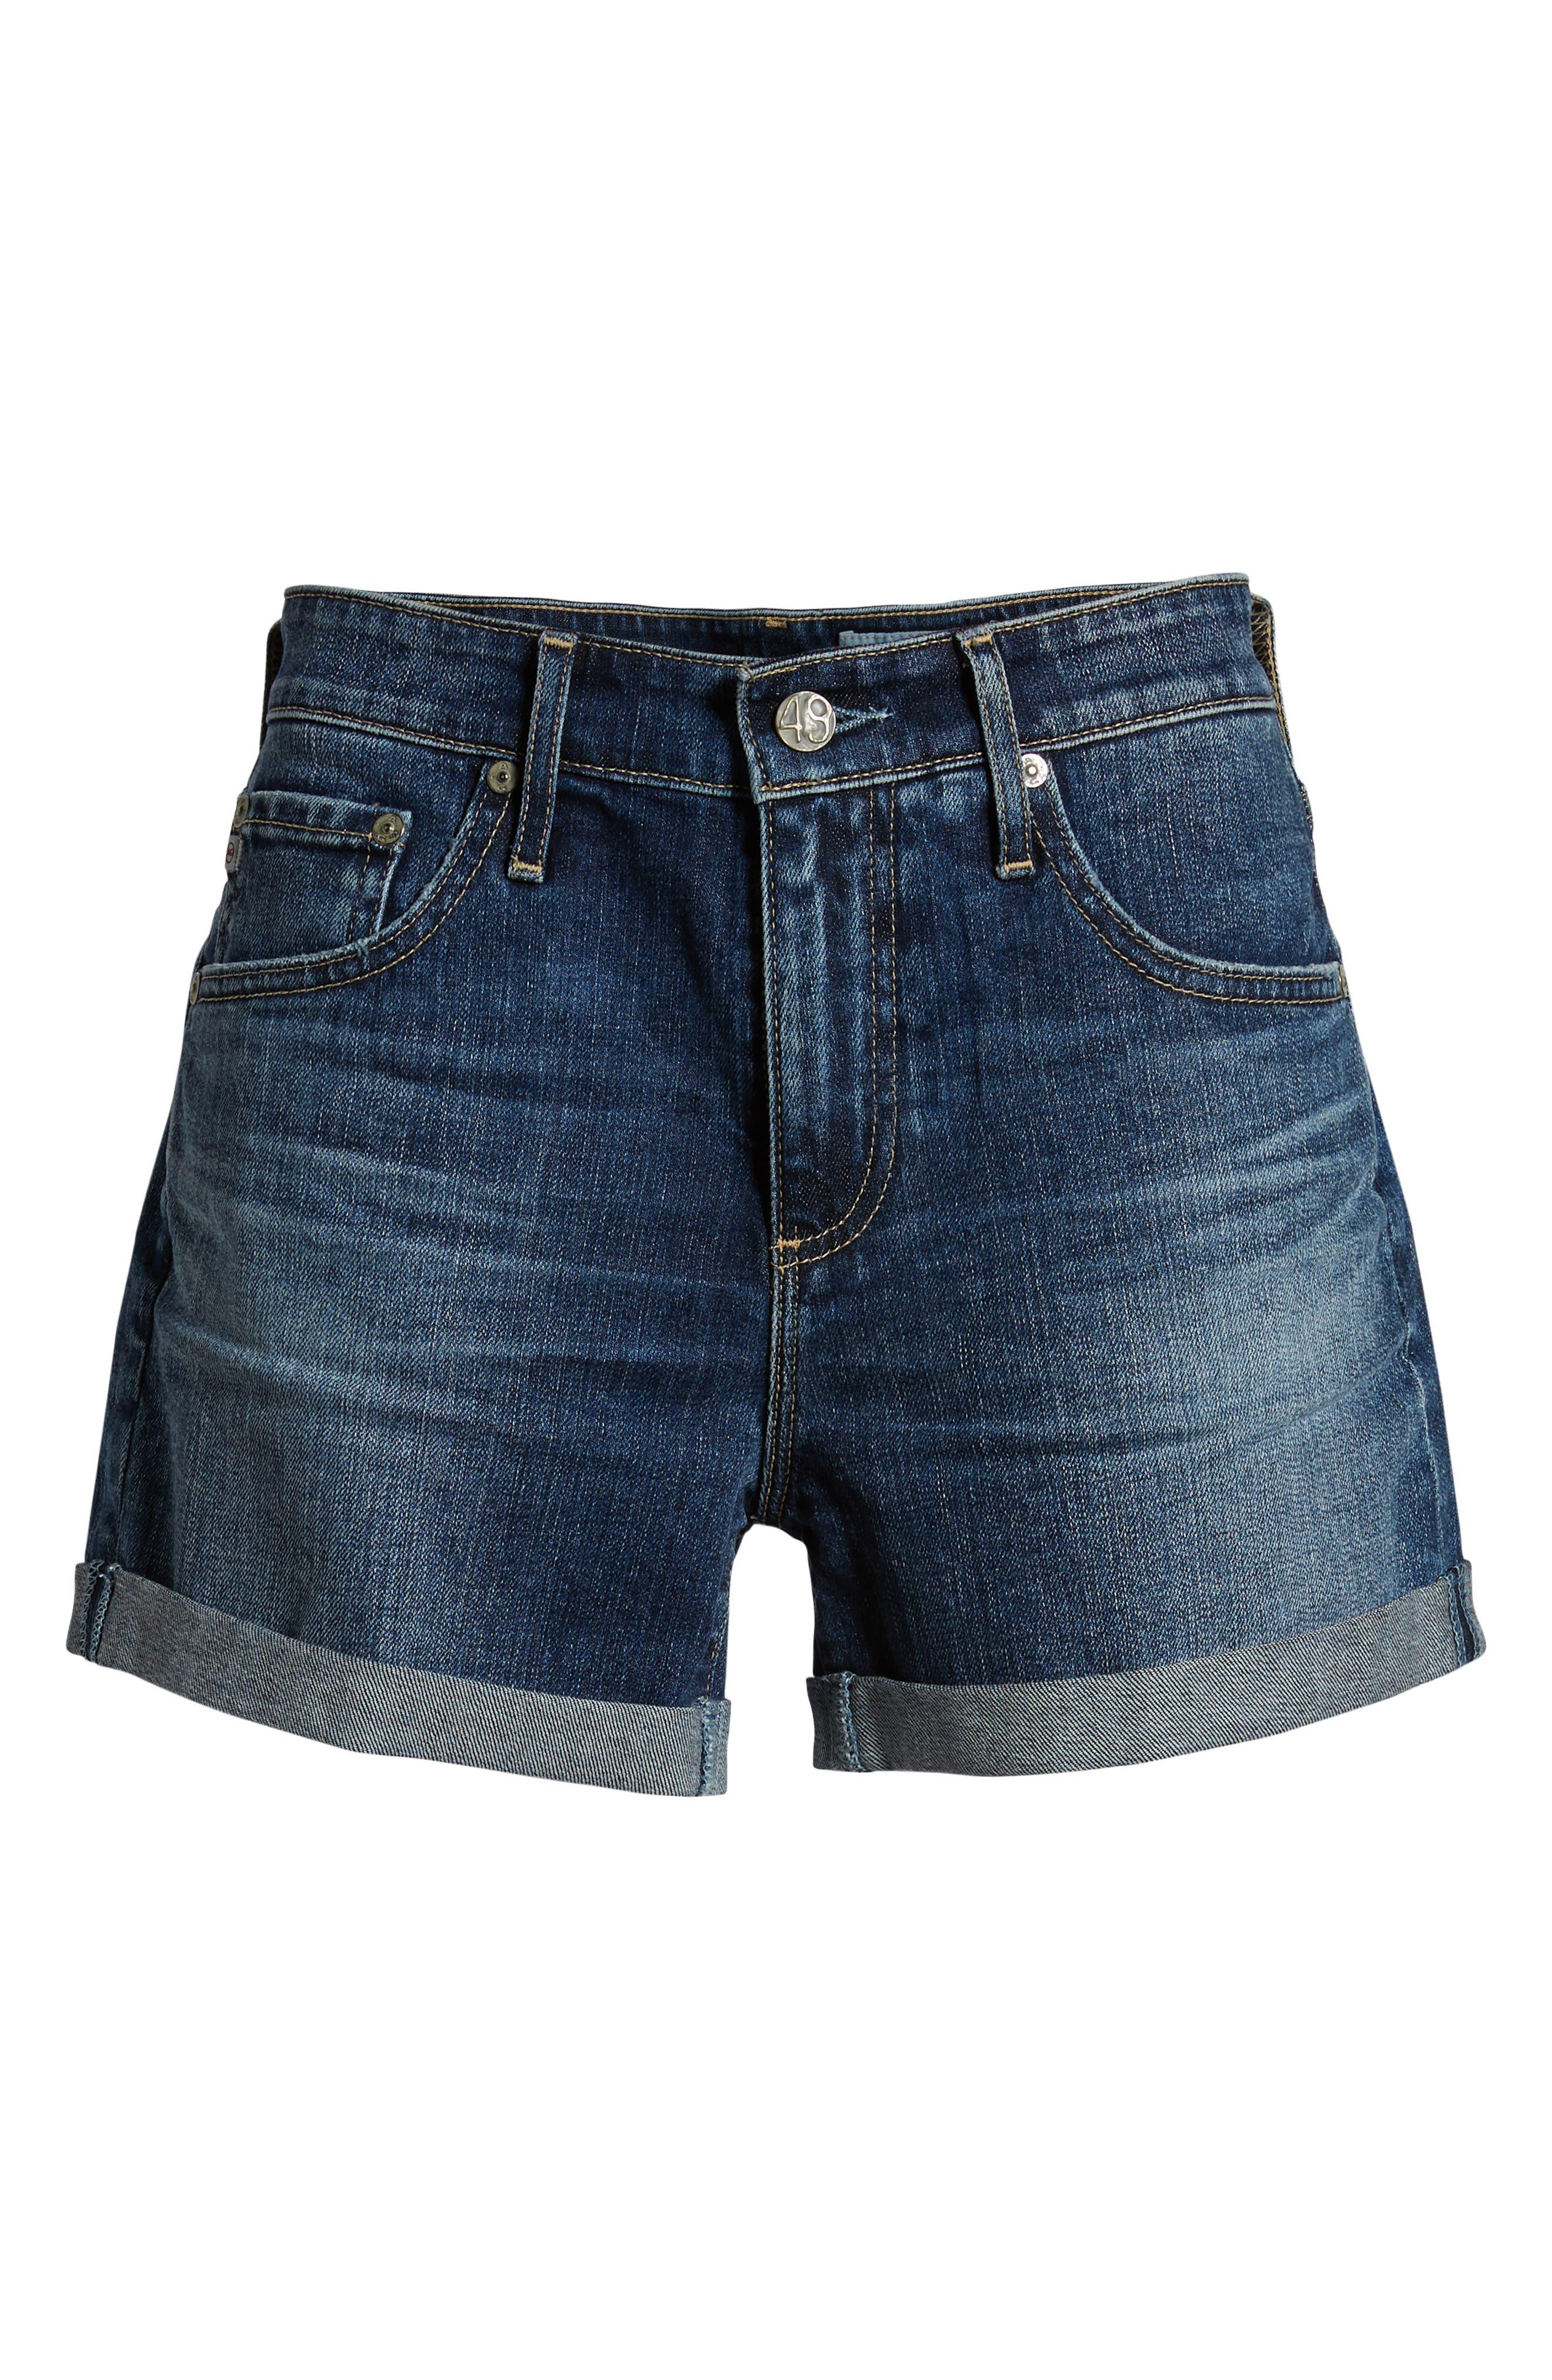 Hailey High Waist Cuff Denim Shorts,                             Alternate thumbnail 7, color,                             18 YEAR INDIGO CITY